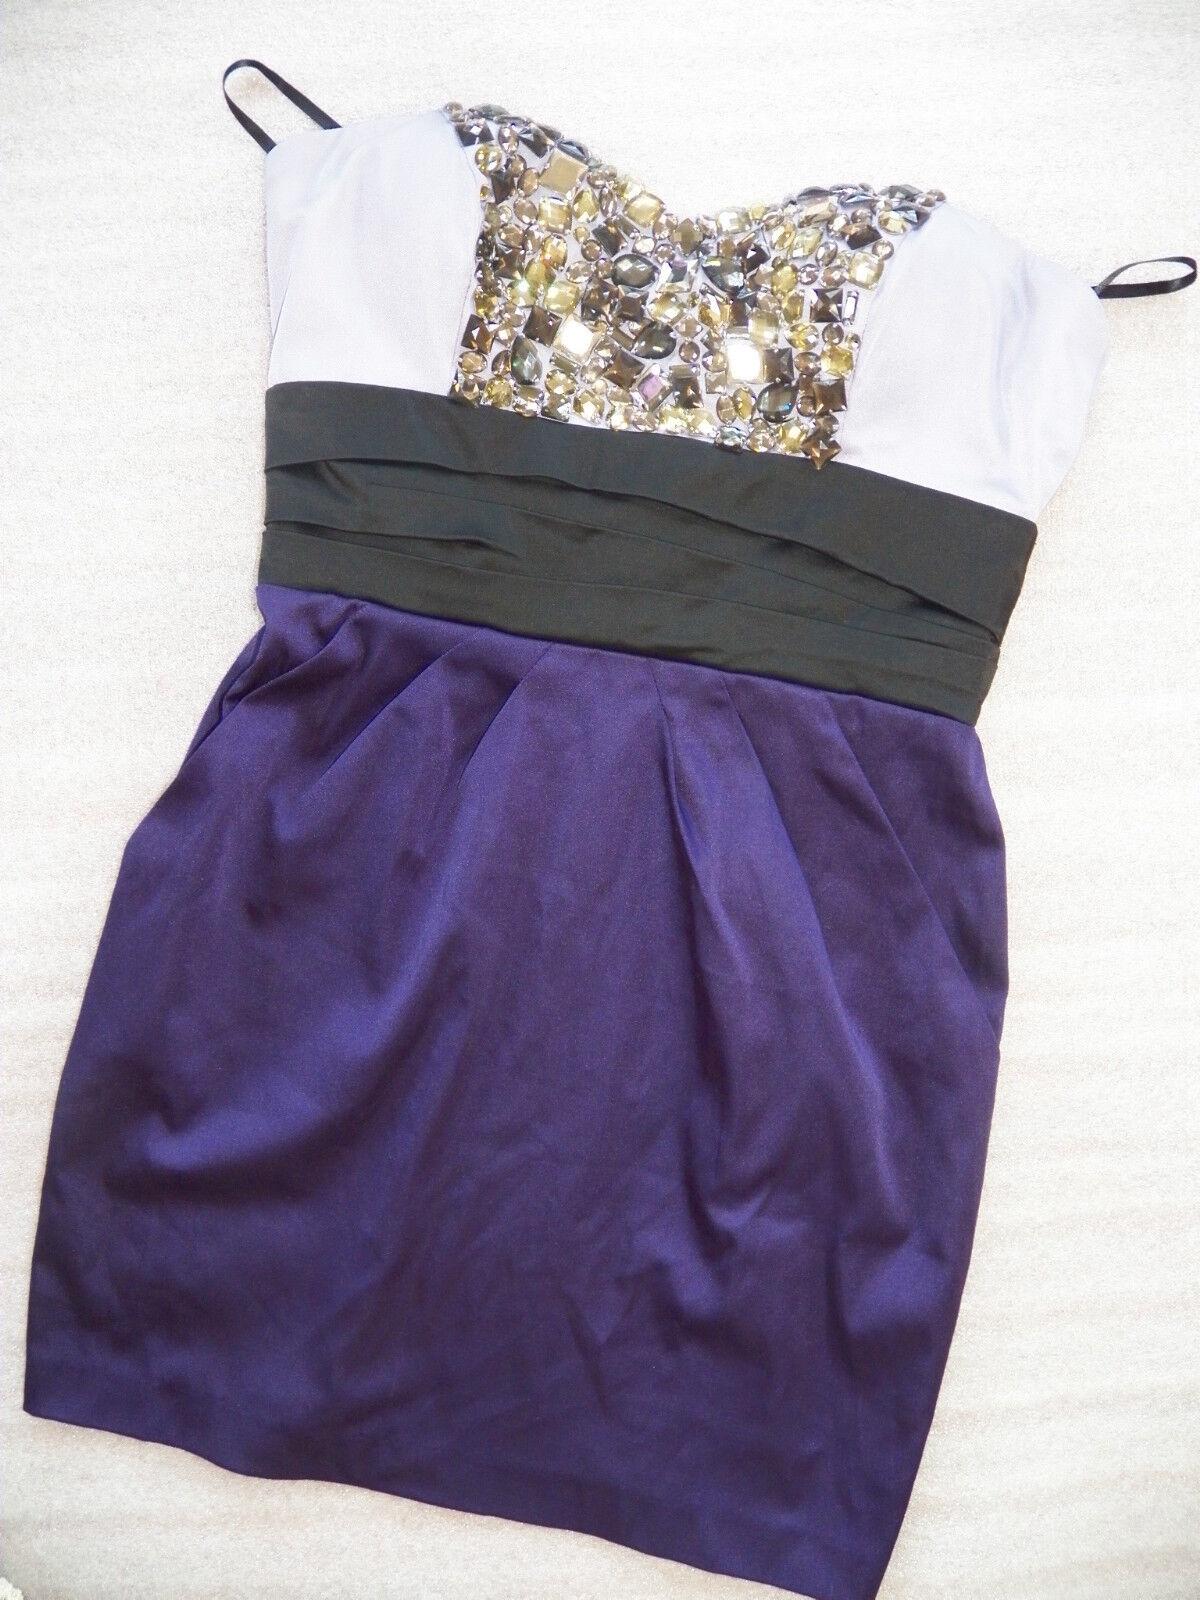 NWT bebe lila schwarz satin crystal beaded bustier strapless top dress M medium